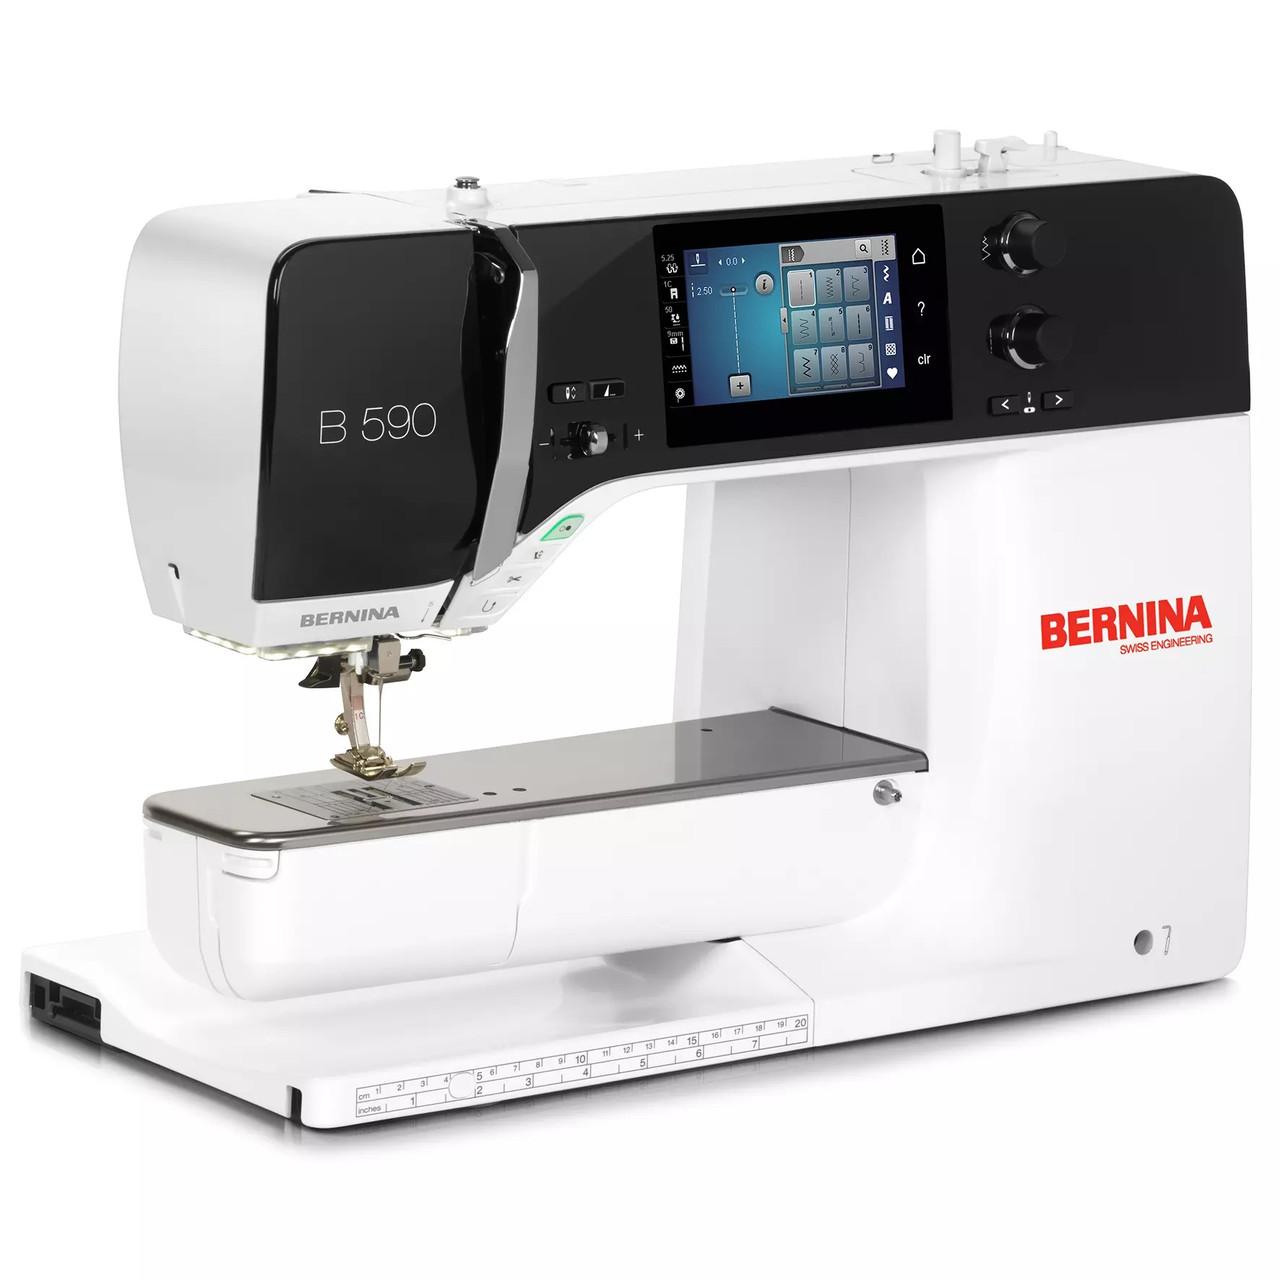 Bernina 590 Sewing & Quilting Machine